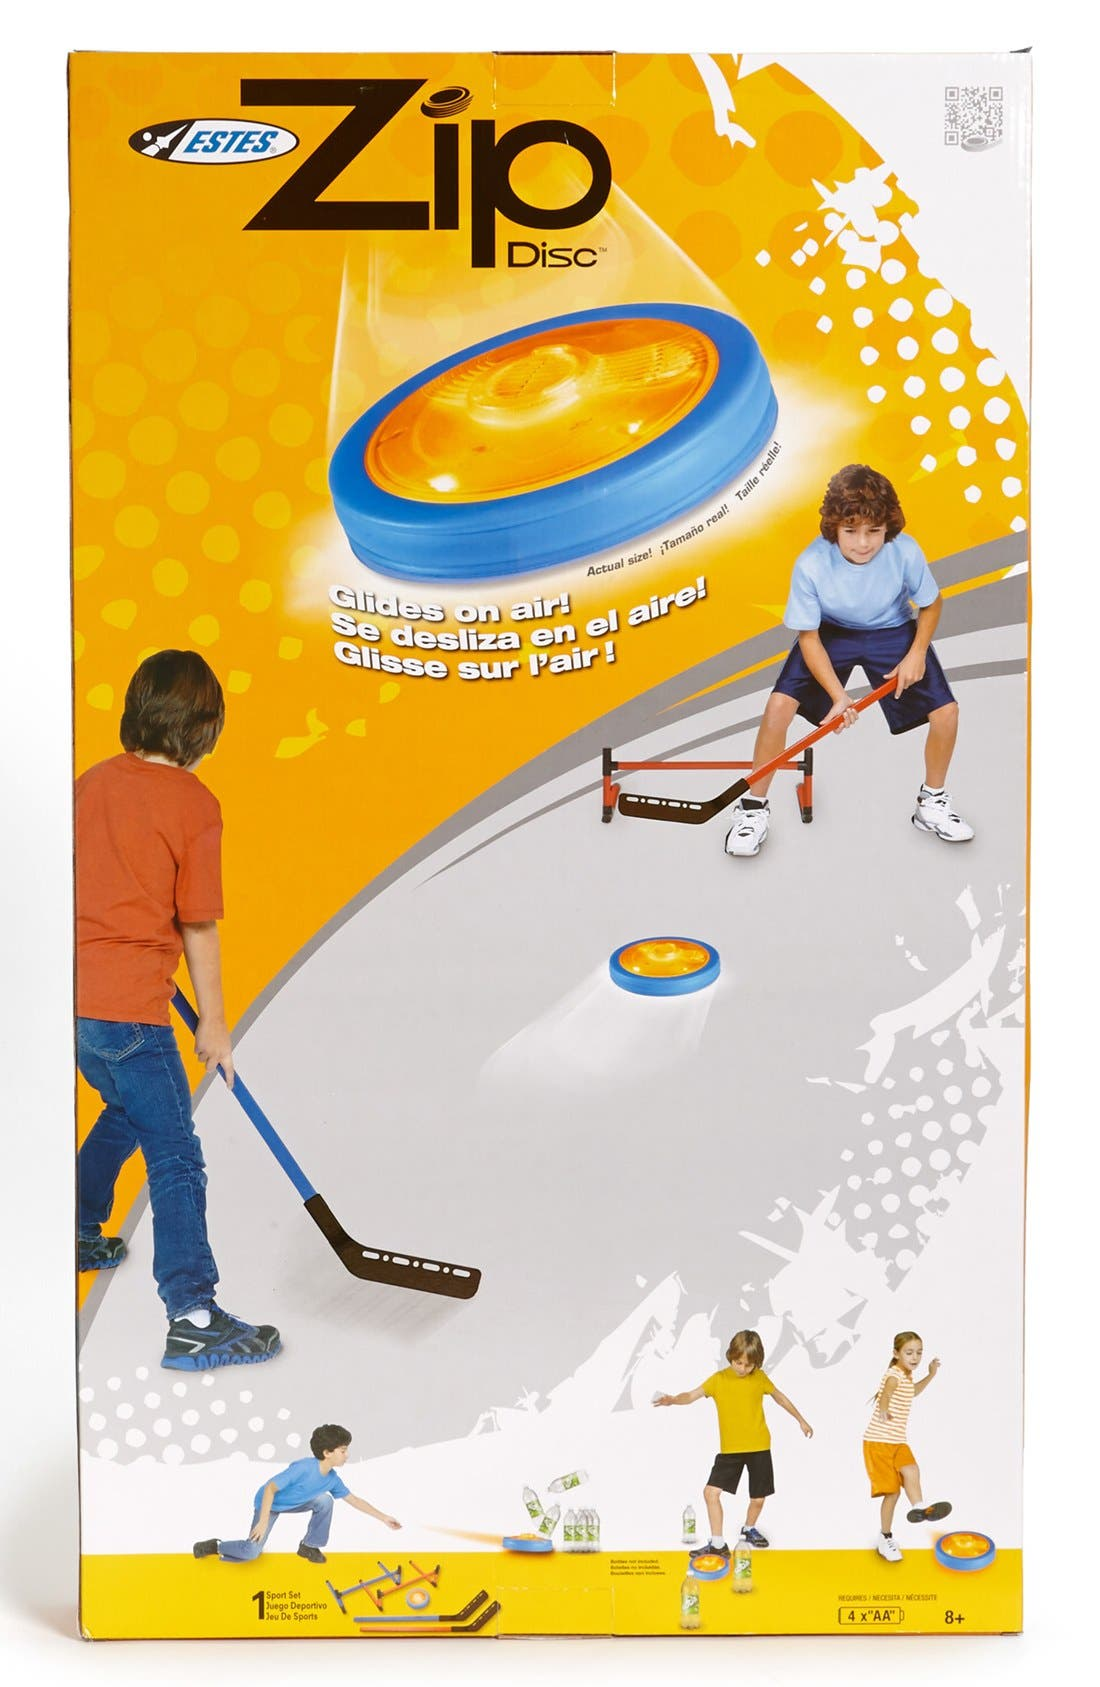 Alternate Image 1 Selected - Estes 'Zip Disc Hockey' Toy Set